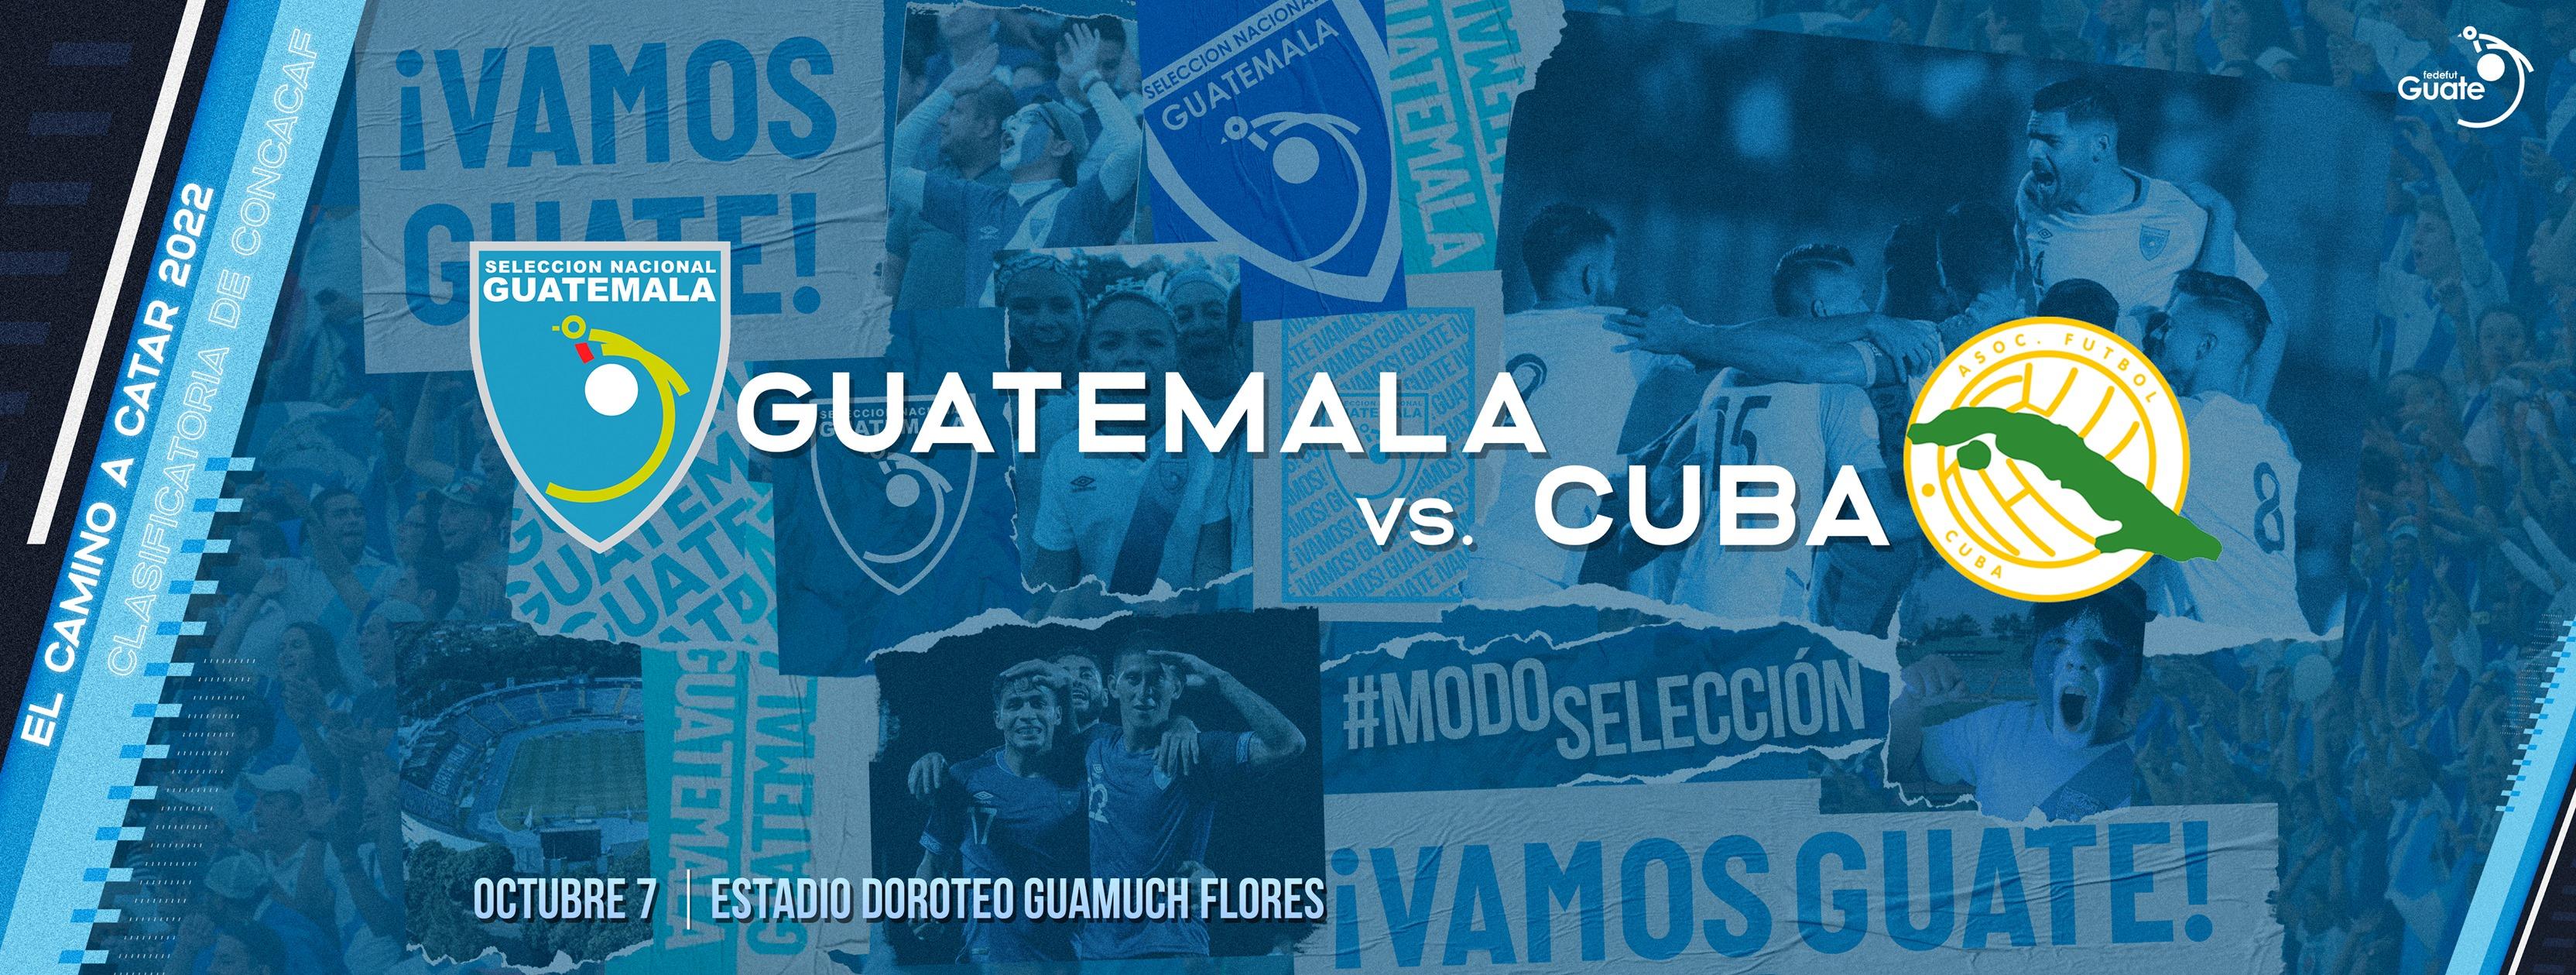 Doroteo Guamuch Flores, sede del partido Guatemala vs Cuba